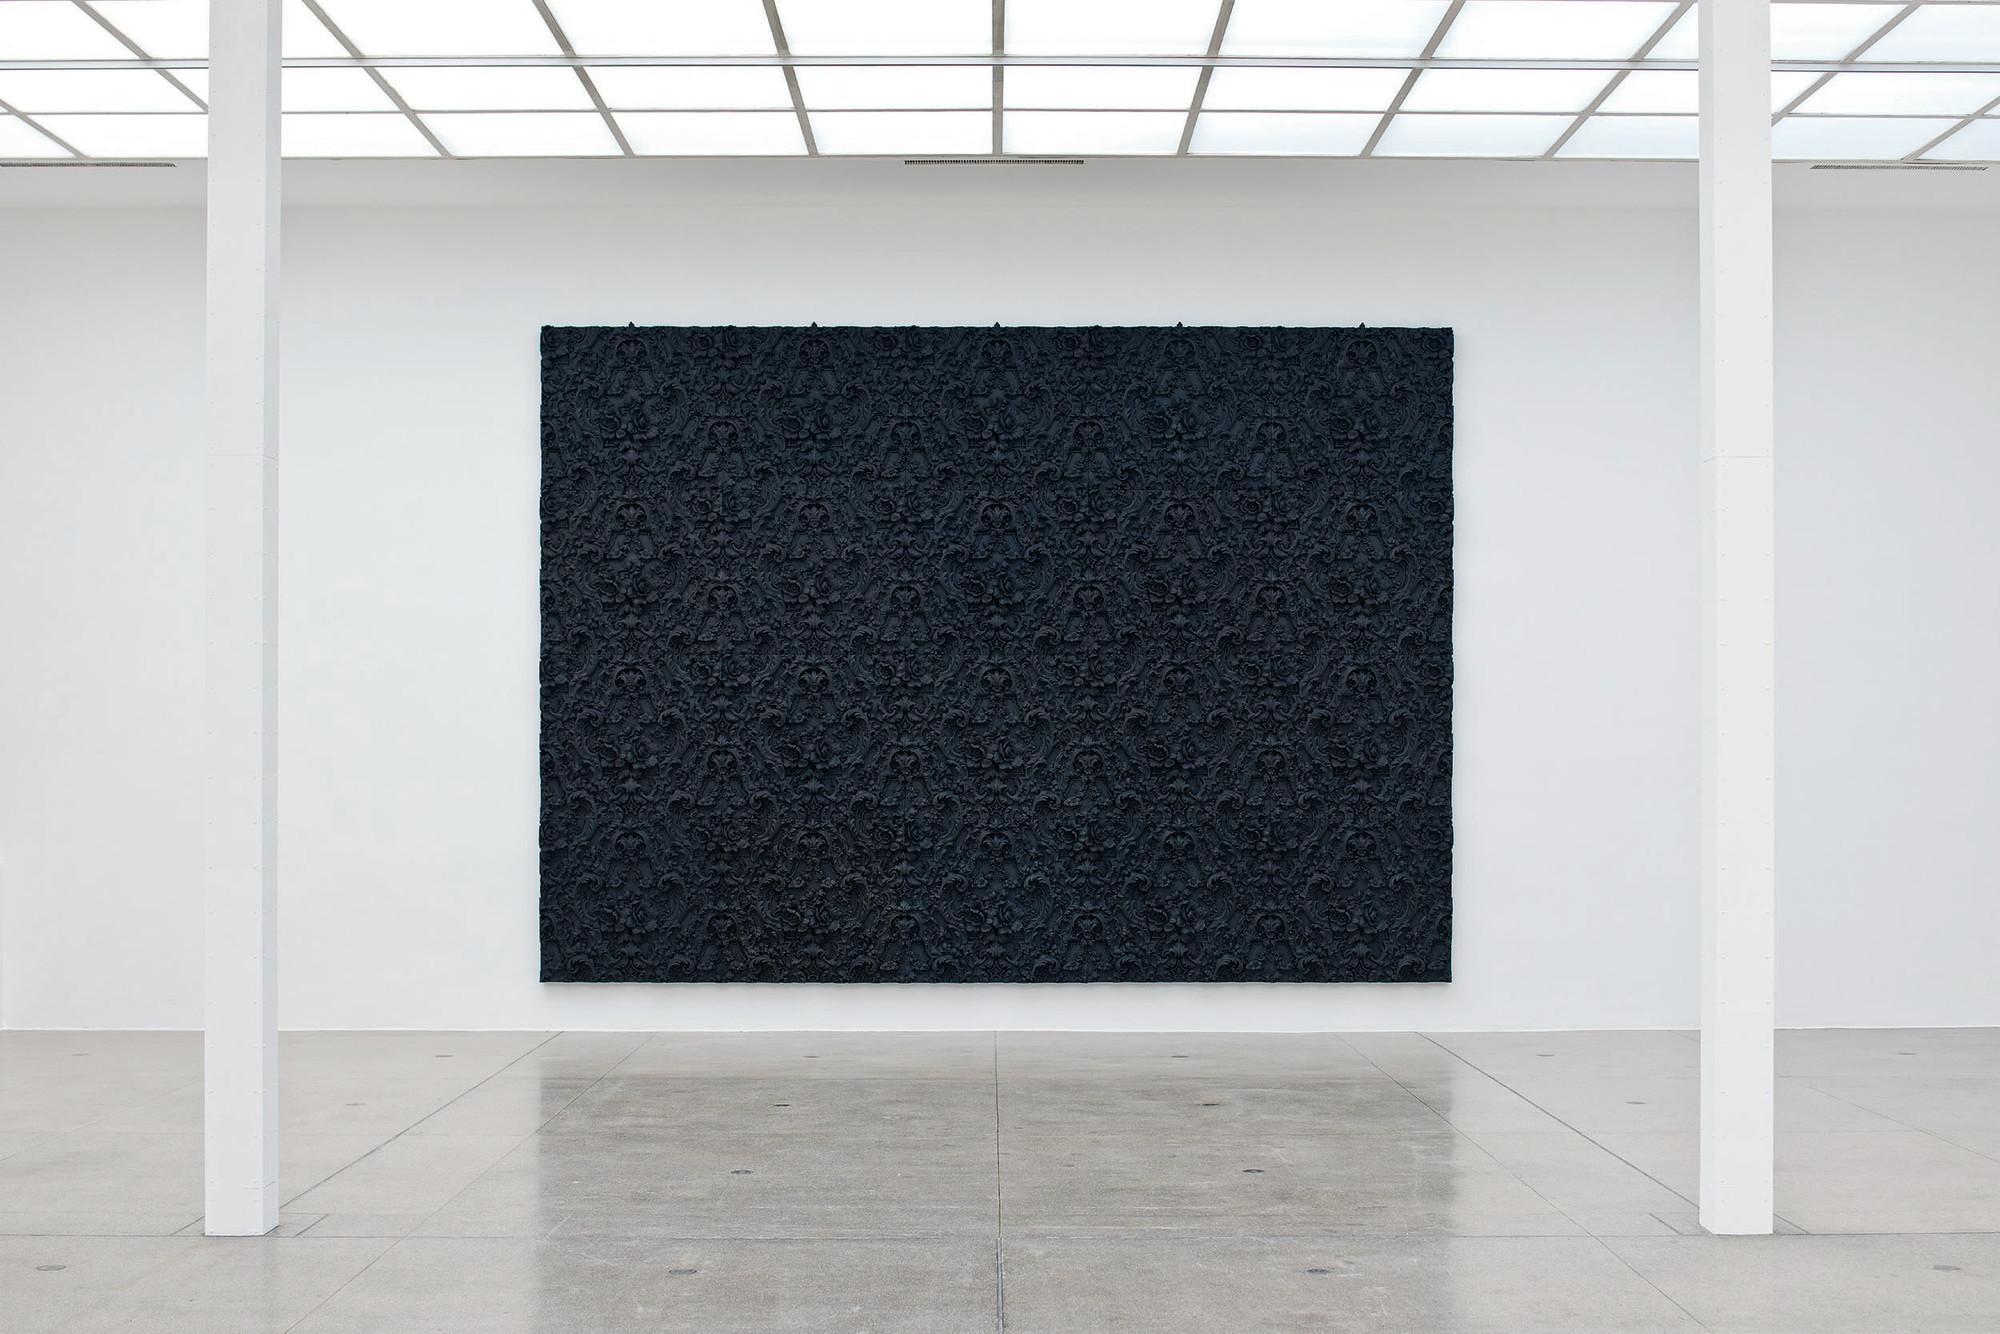 <p><em>Untitled (1631)</em>, Installation view, Rudolf Stingel, Secession, Vienna, 23 February – 15 April 2012</p><p>Photo: Jorit Aust</p>